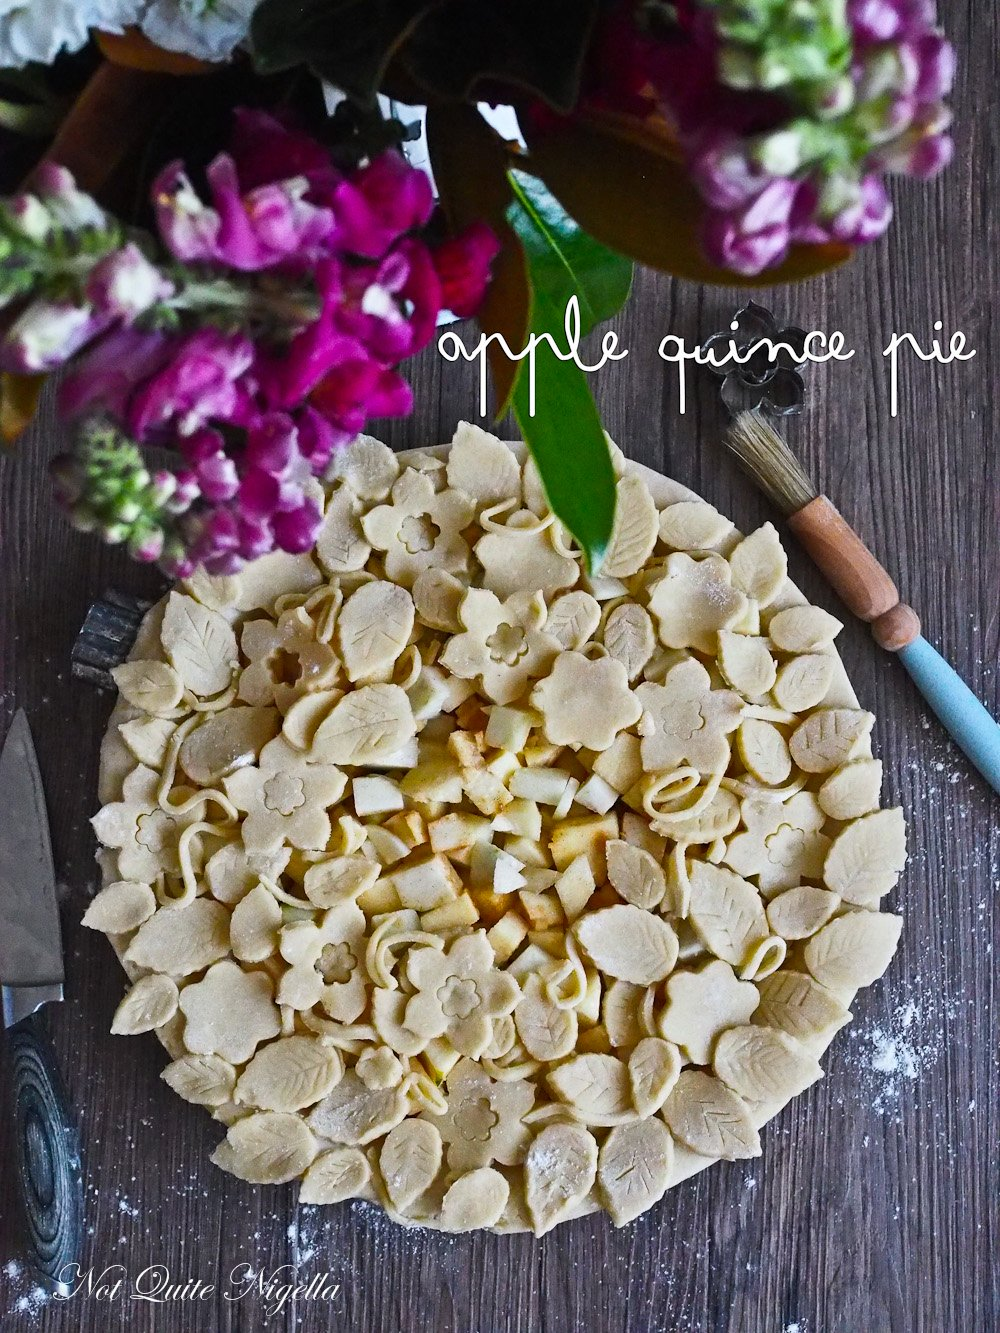 Apple Quince Pie Fancy Pastry